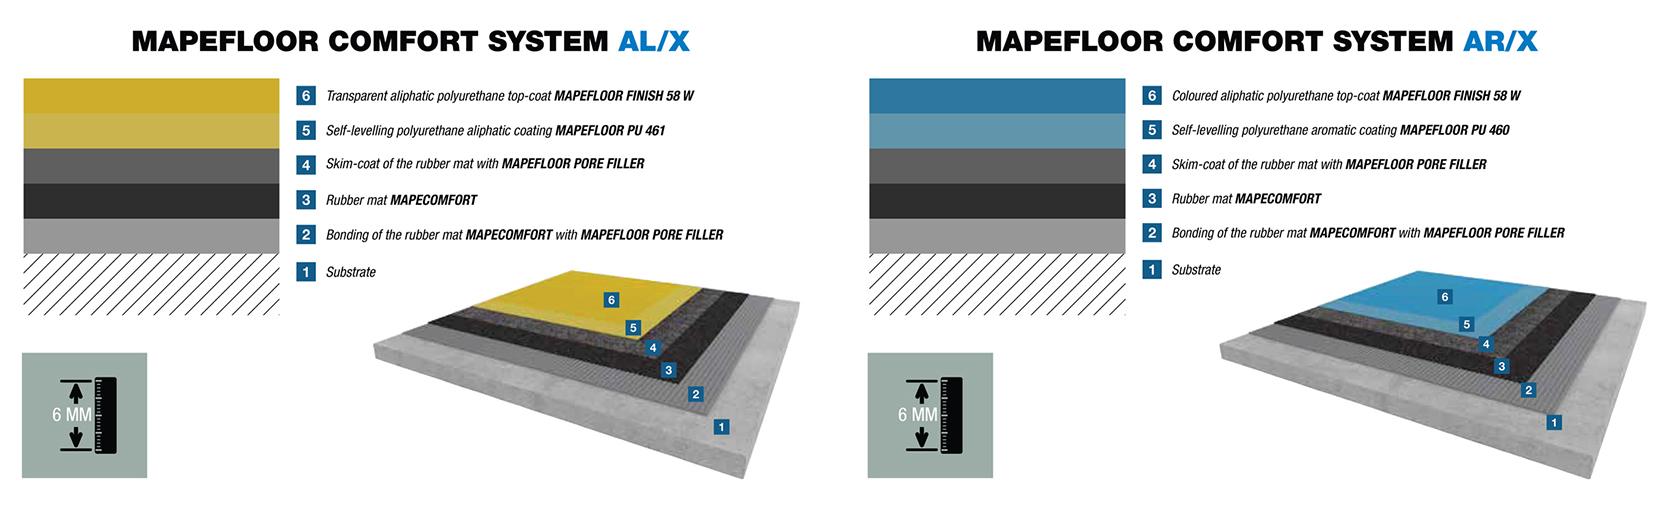 Mapefloor-comfort-system-AR